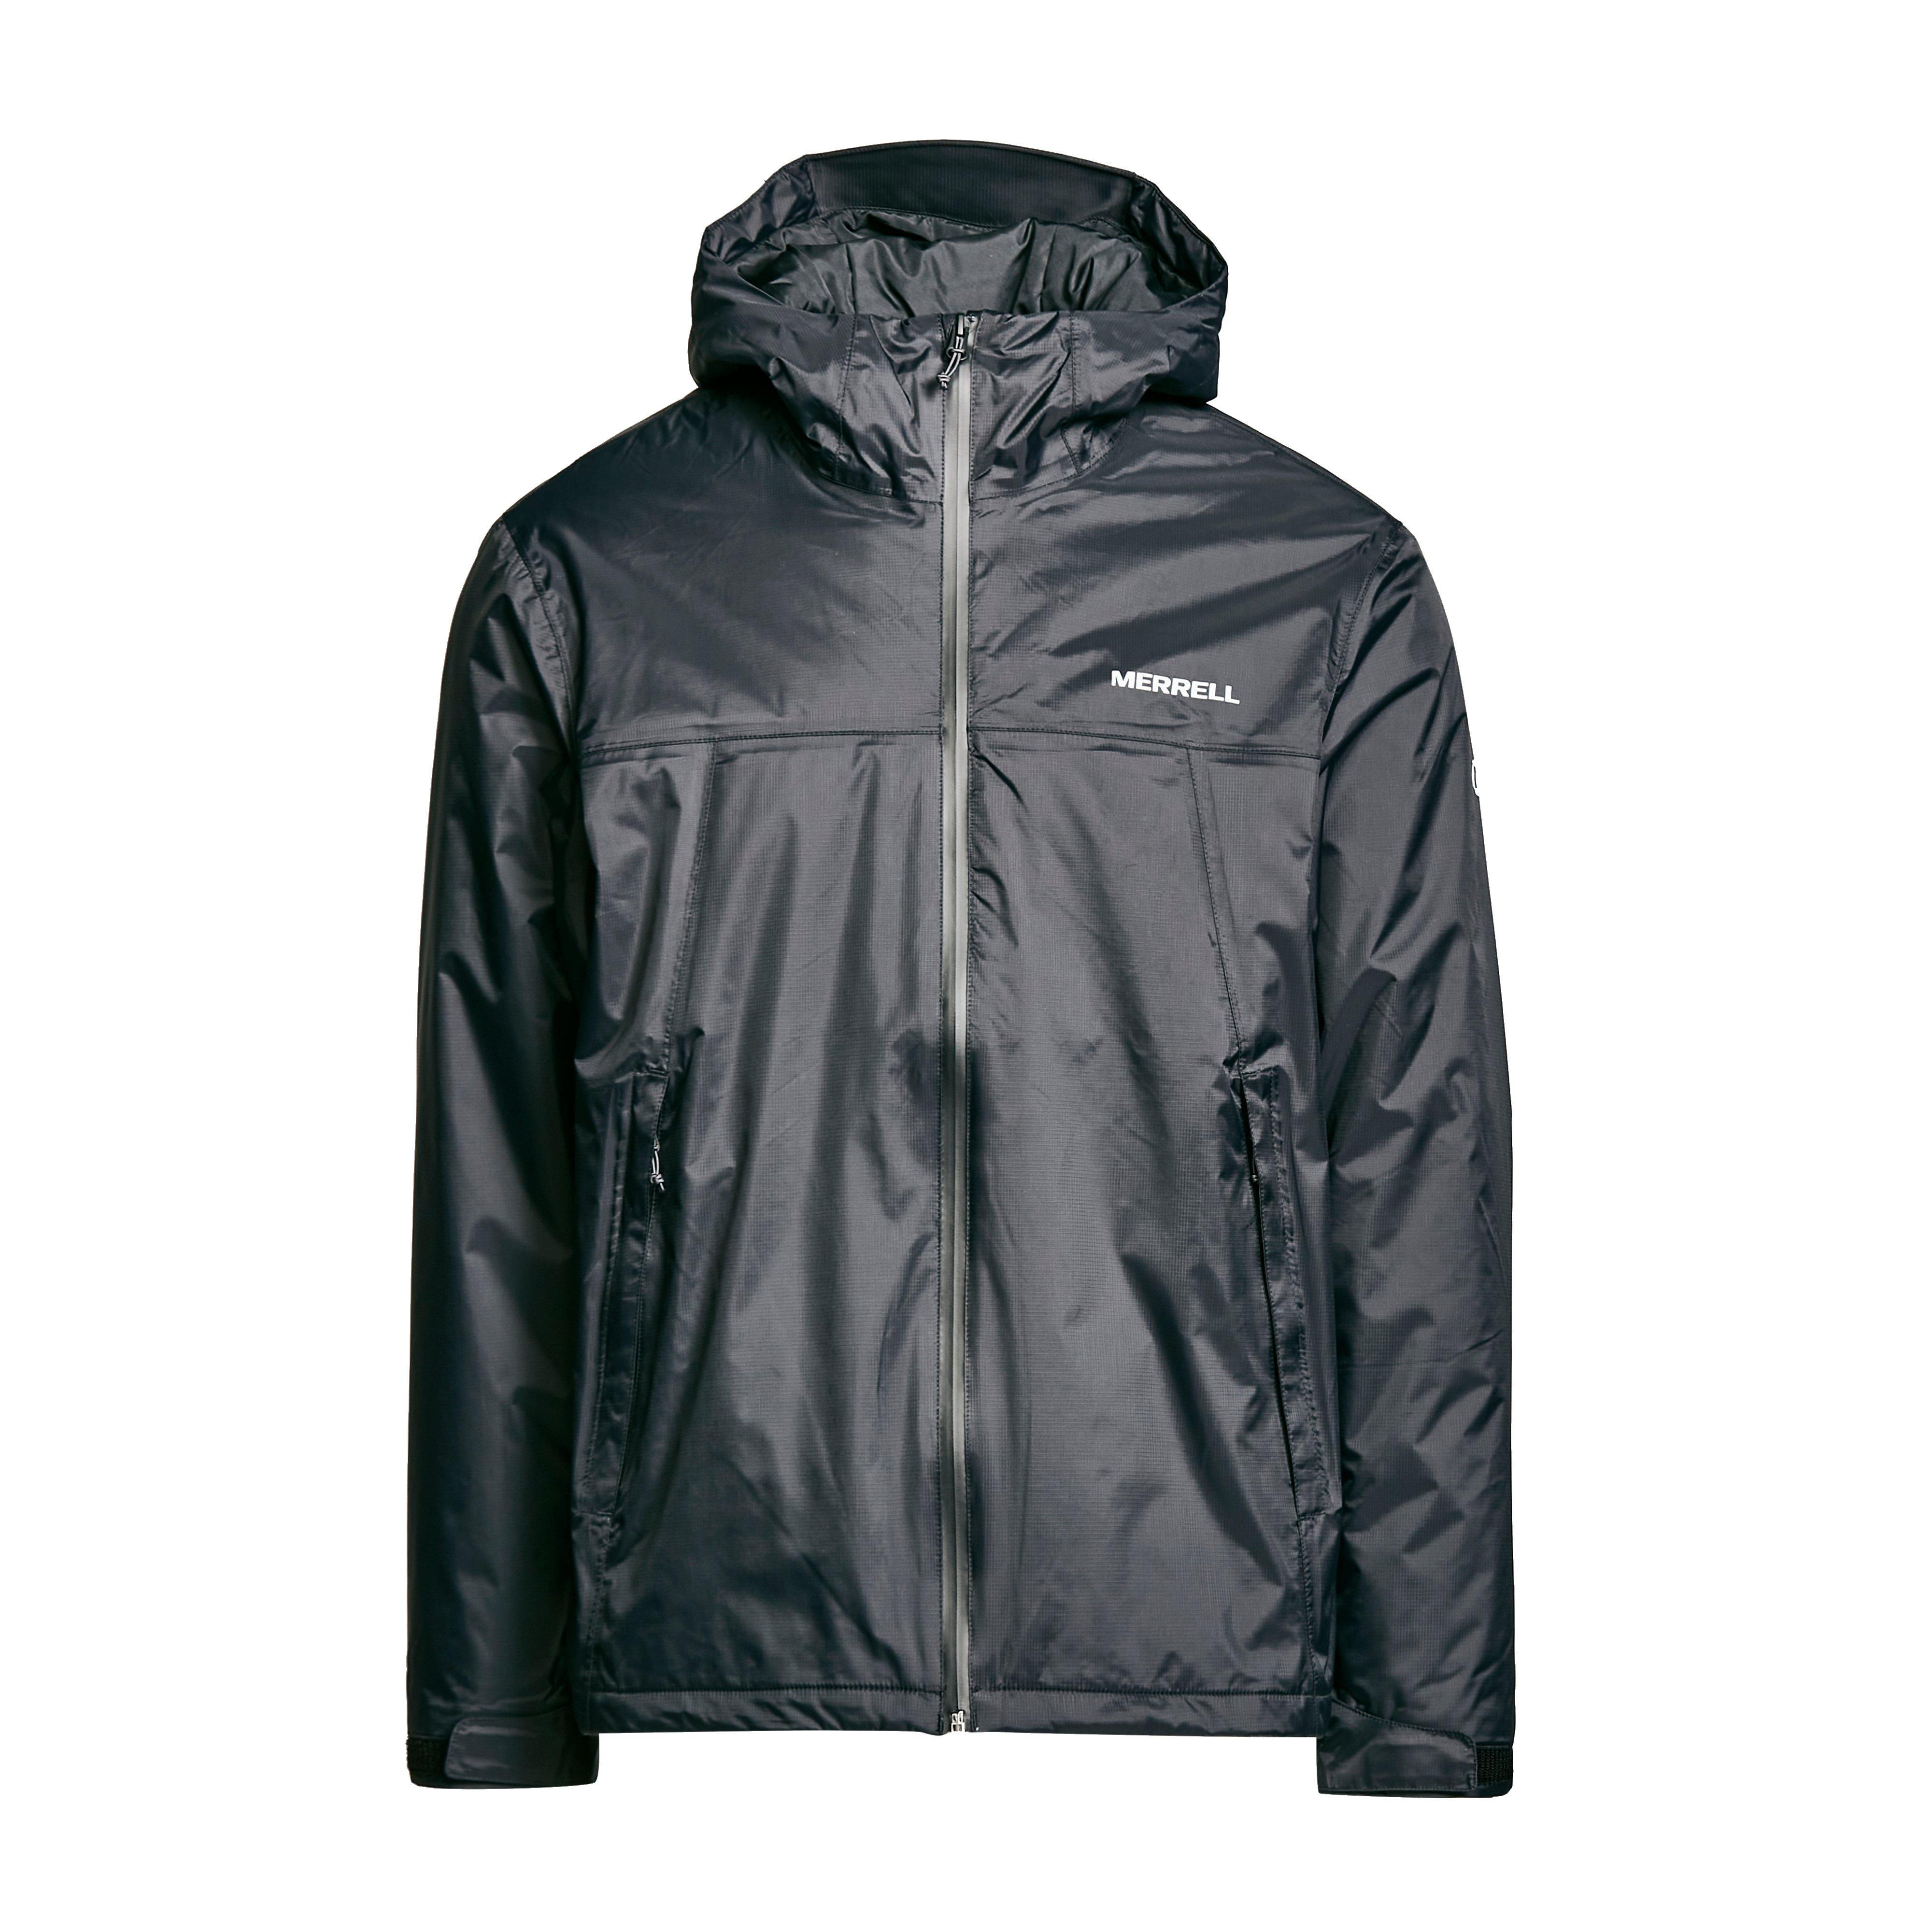 Merrell Men's Fallon Insulated Jacket - Black/Black, Black